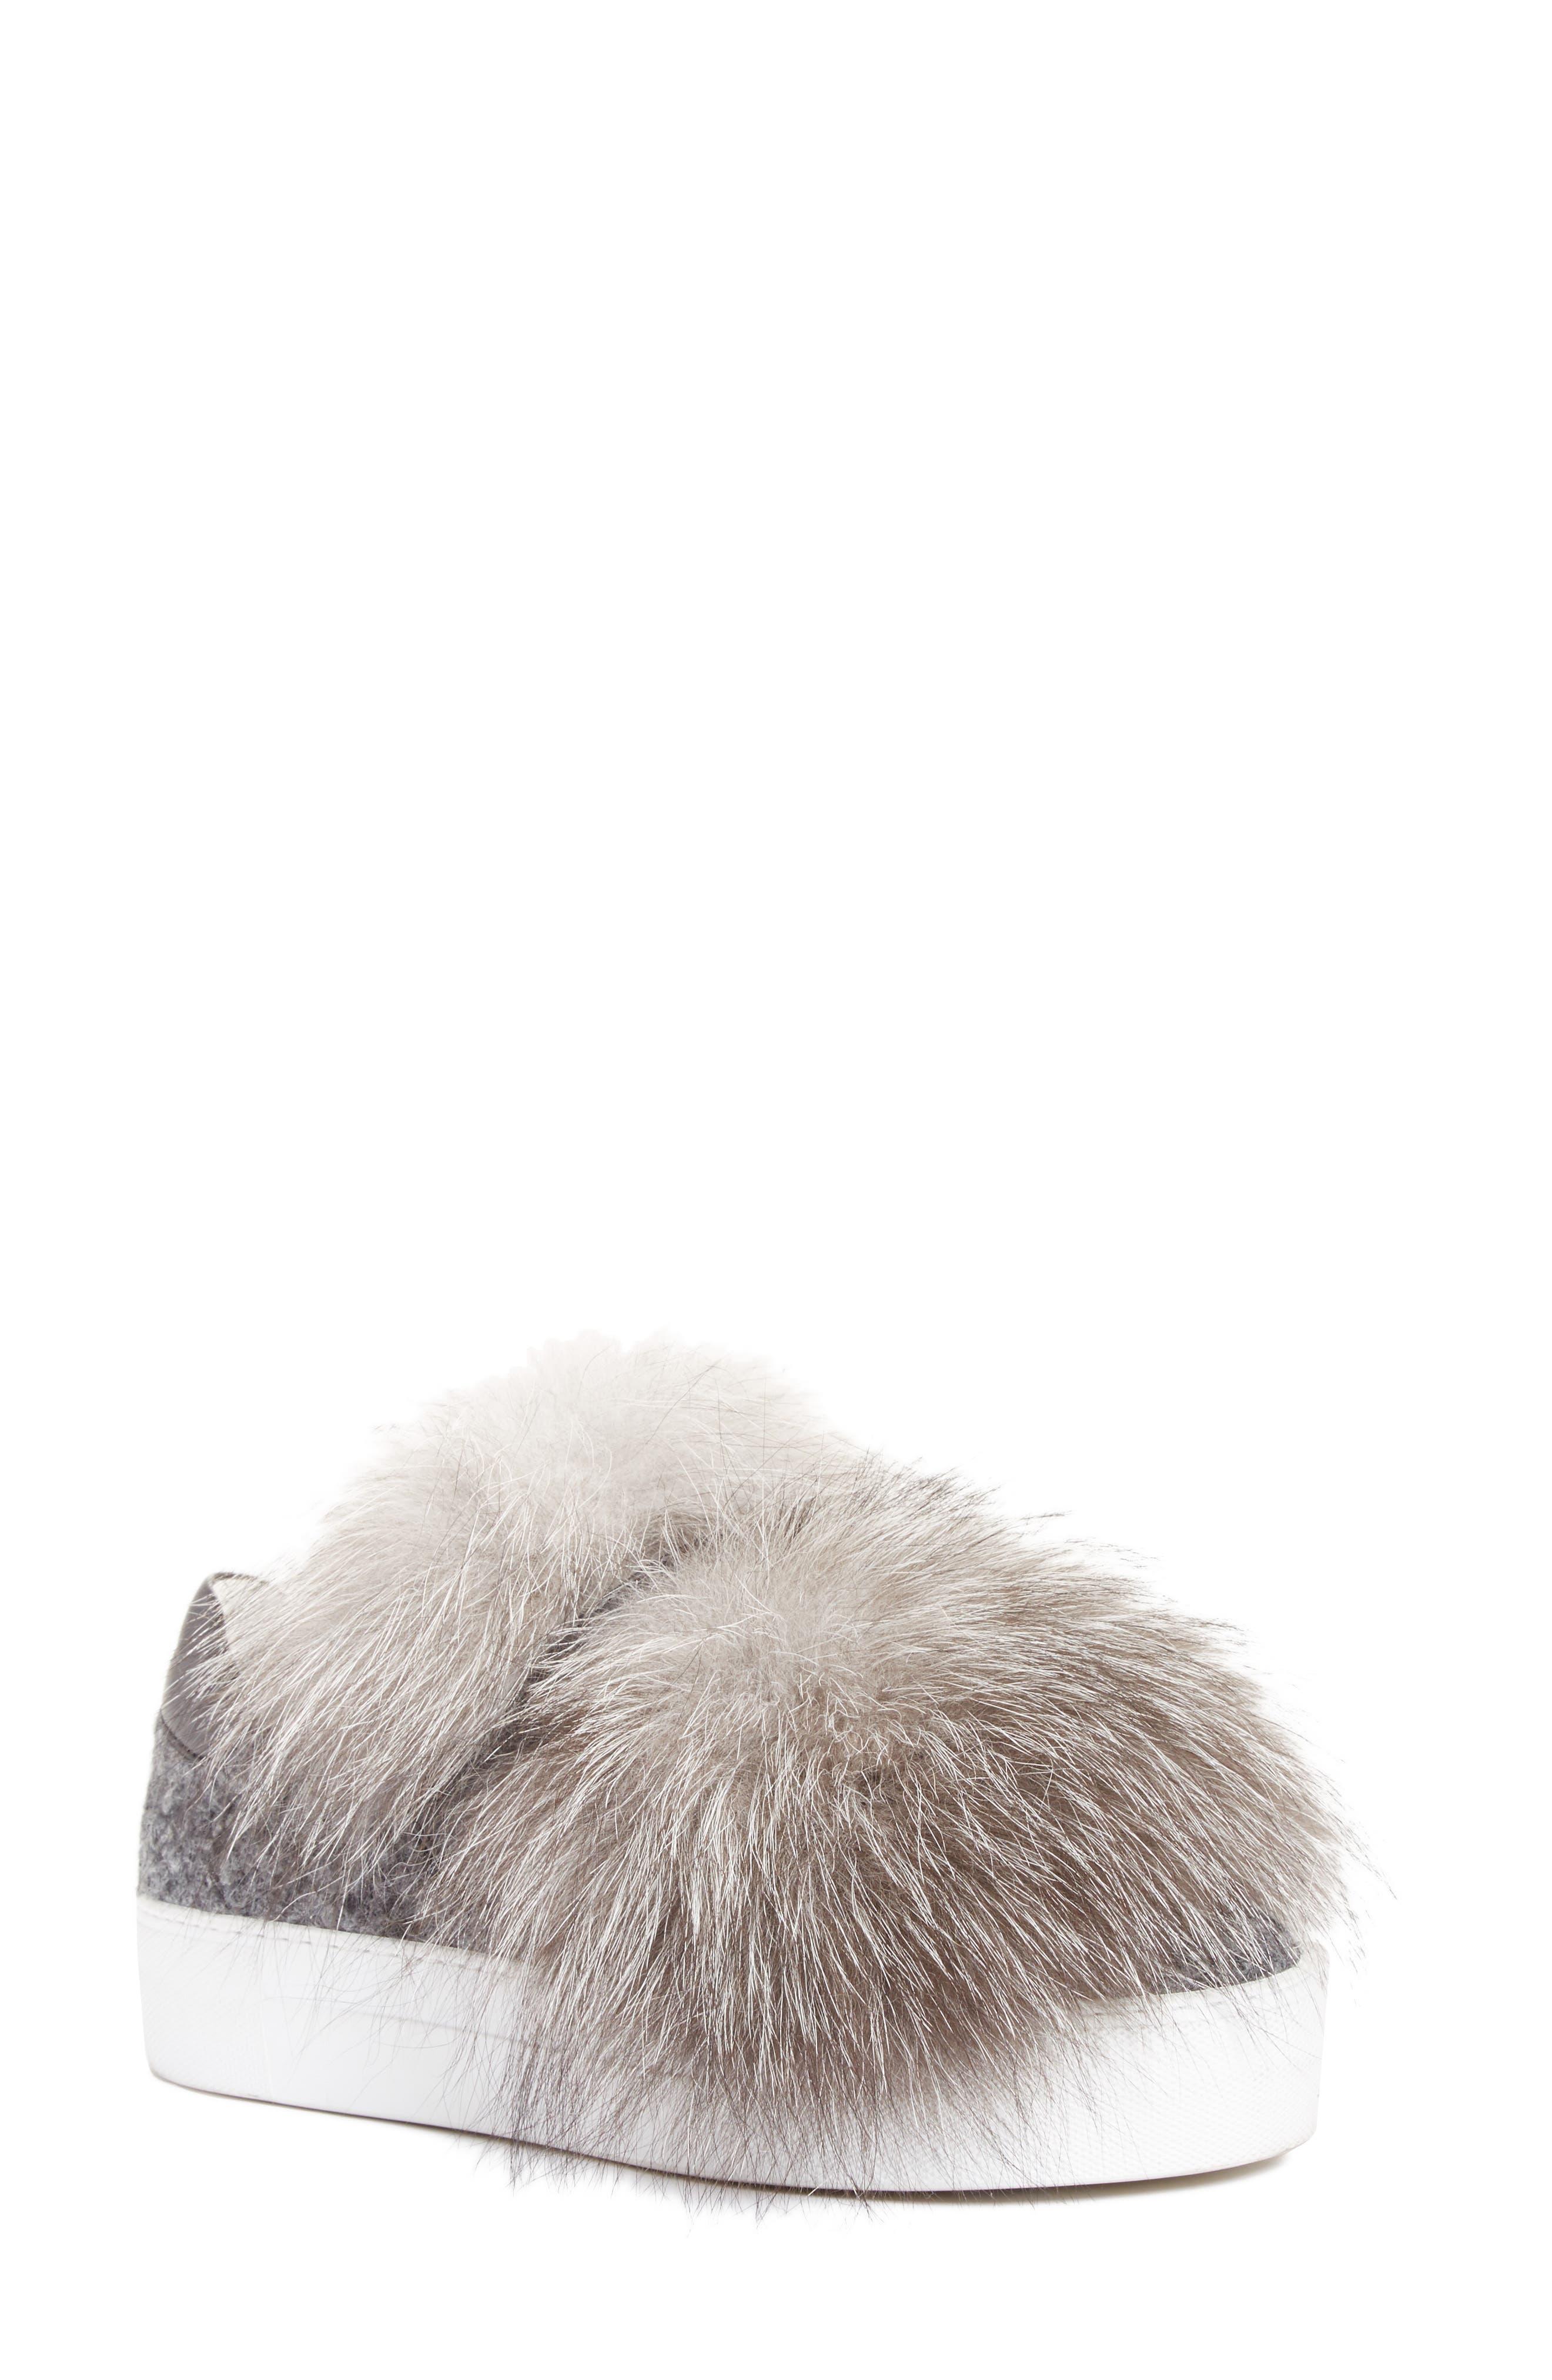 Victoire Genuine Fox Fur Slip-On Sneaker,                             Main thumbnail 1, color,                             020